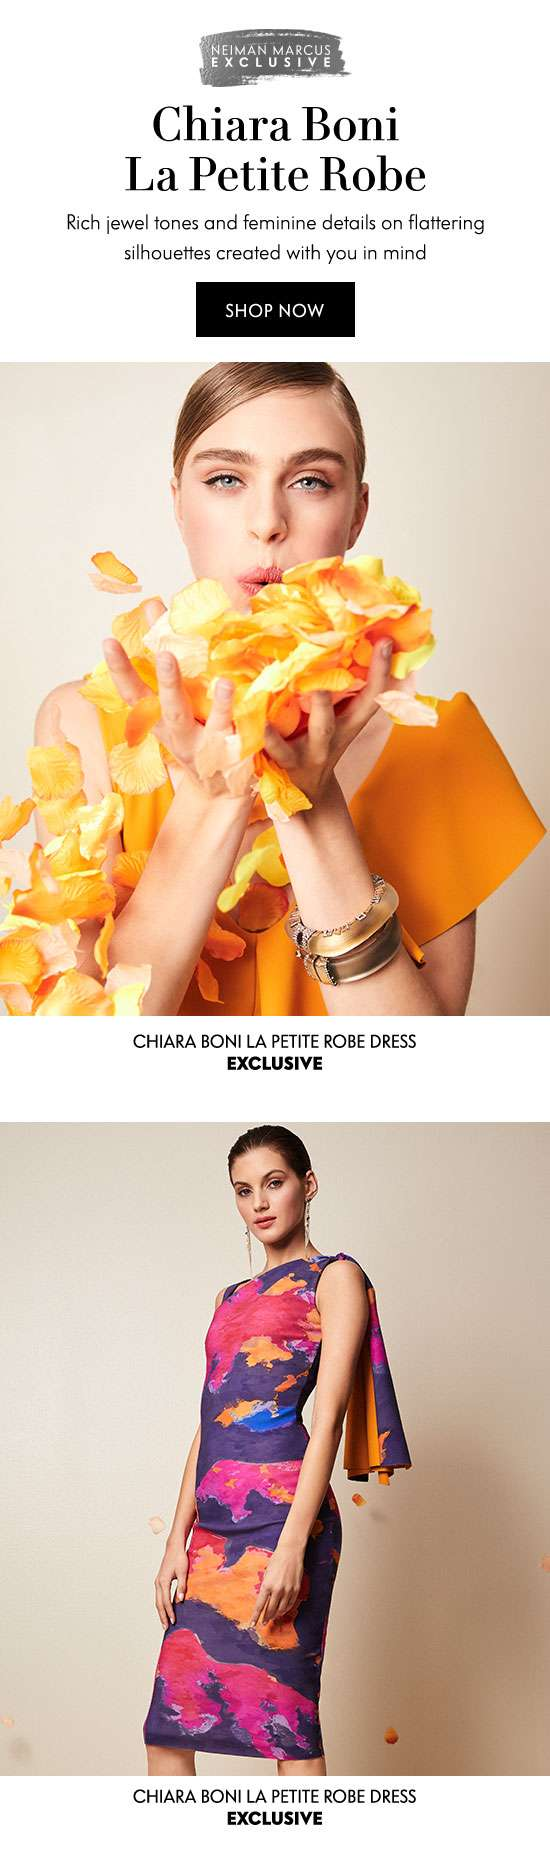 Shop Chiara Boni La Petite Robe